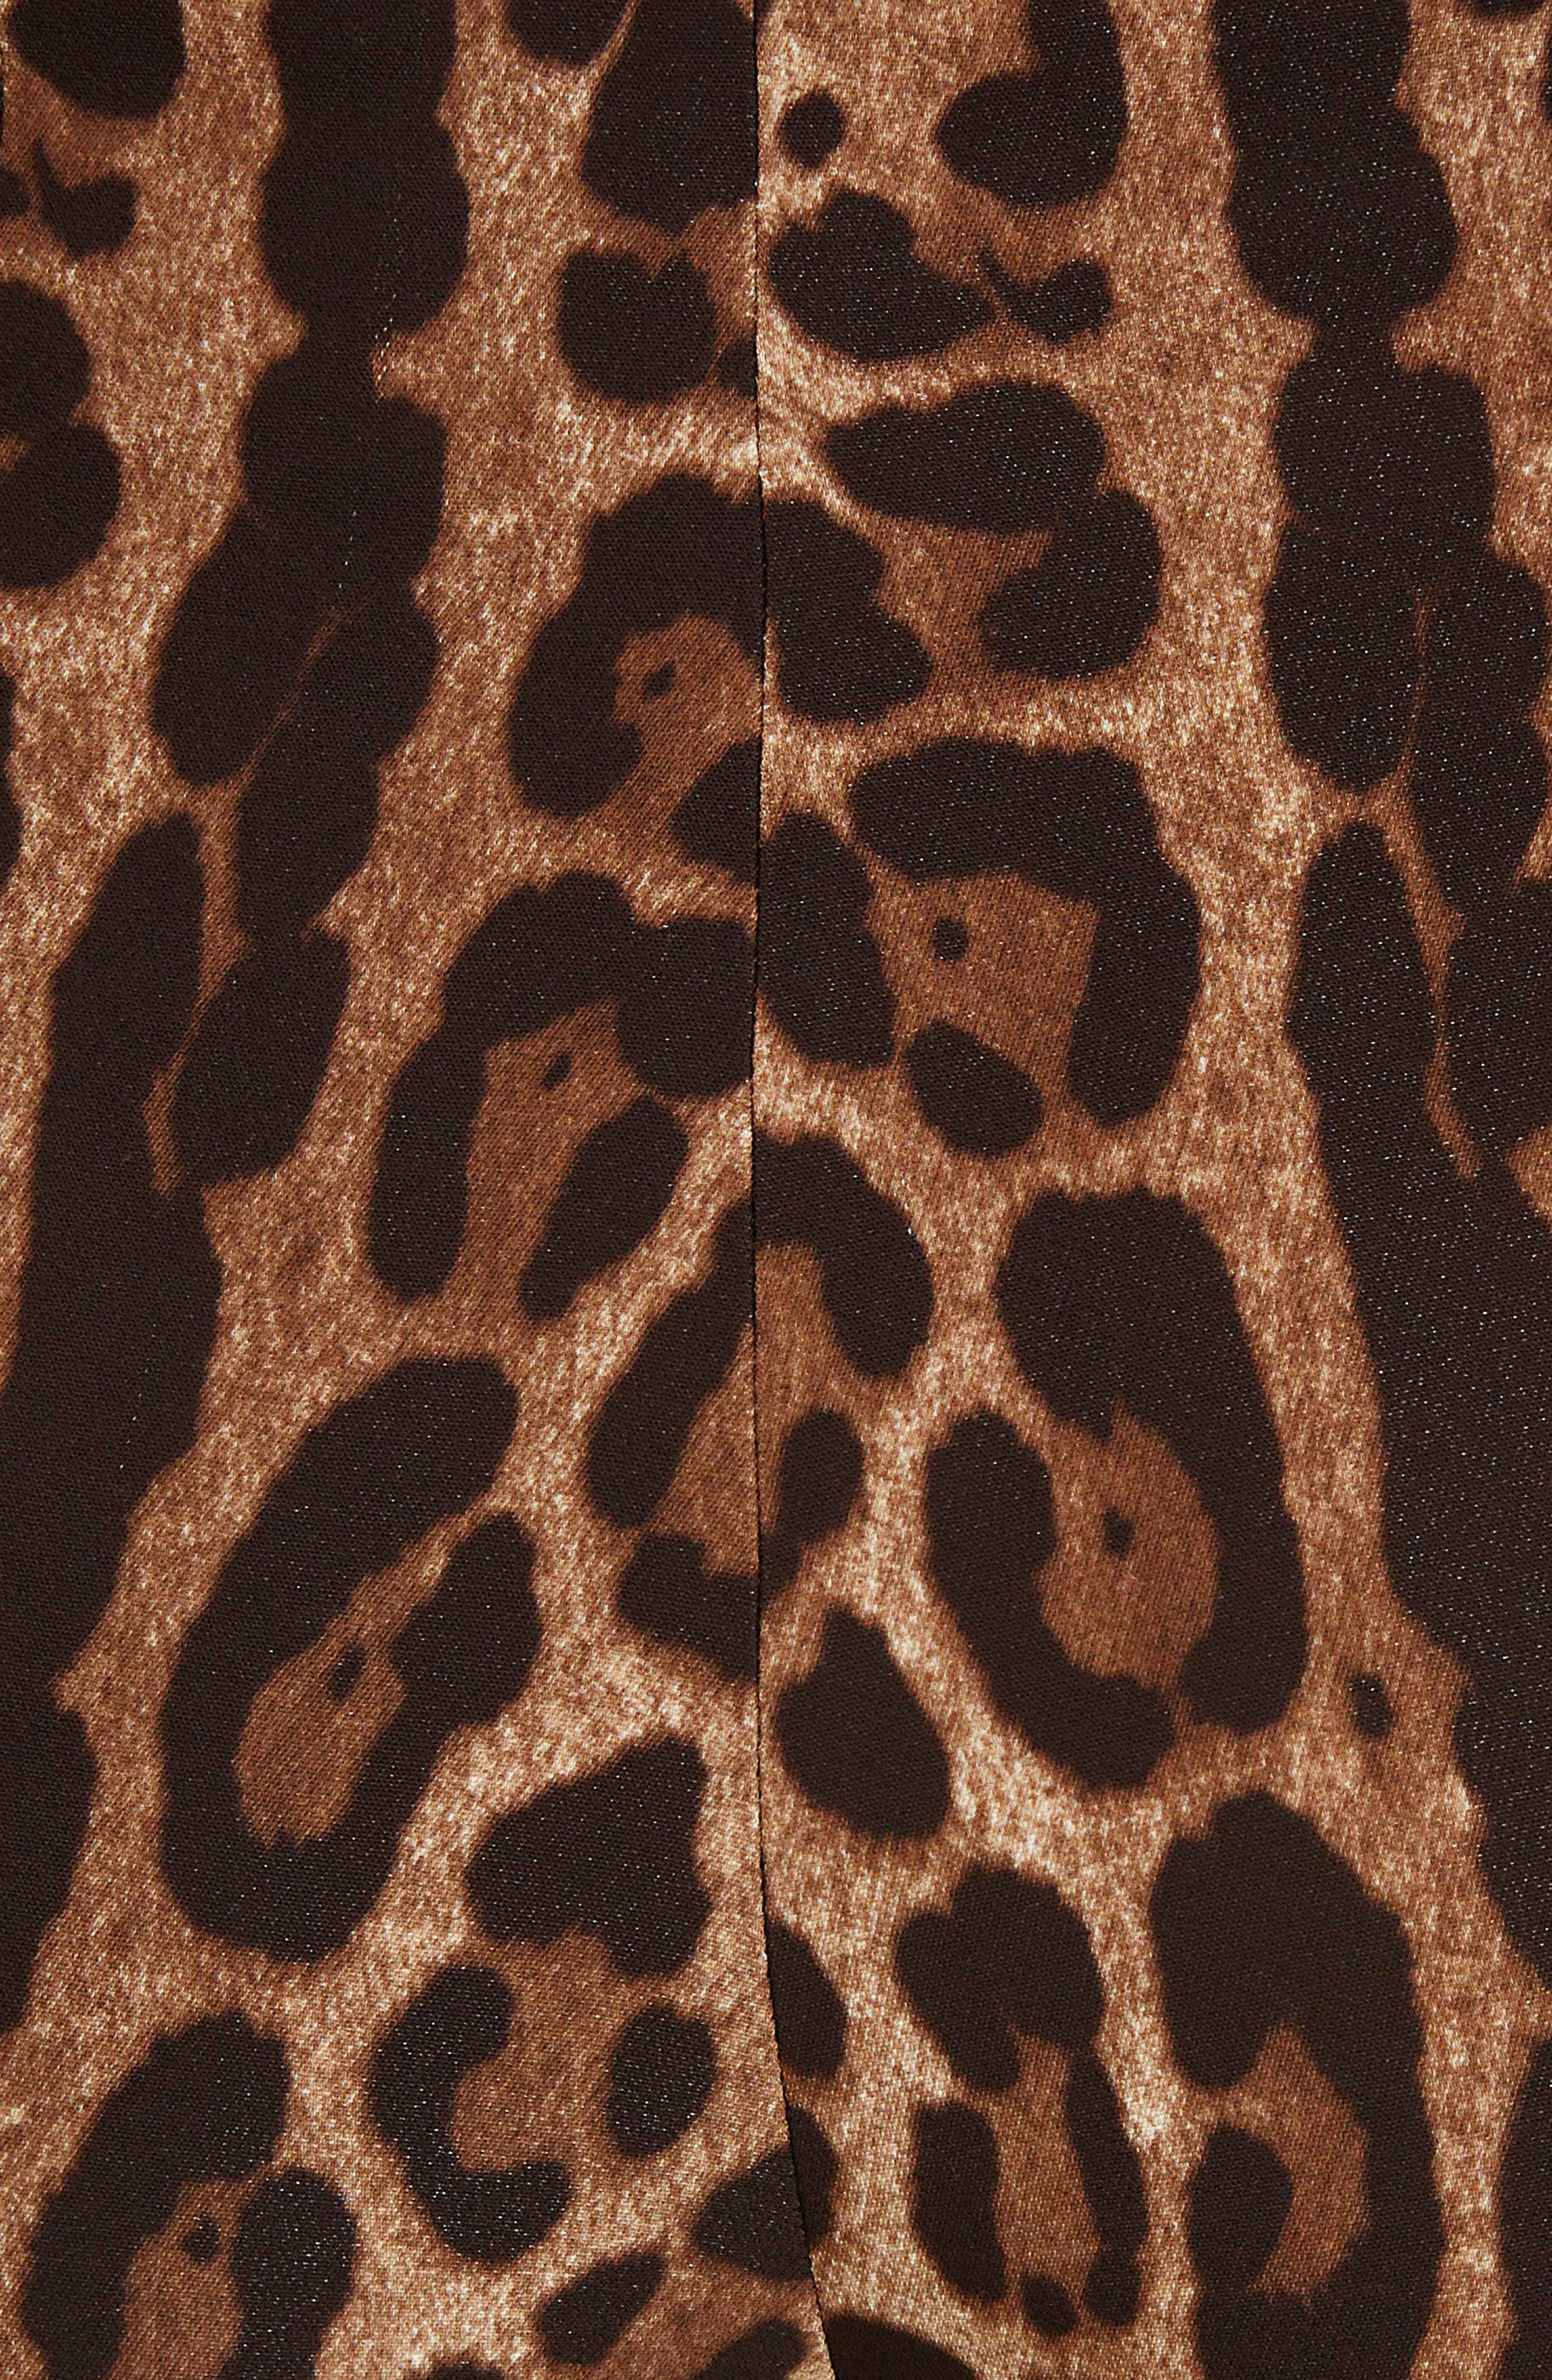 DOLCE&GABBANA, Leopard Print Cady Leggings, Alternate thumbnail 5, color, LEO